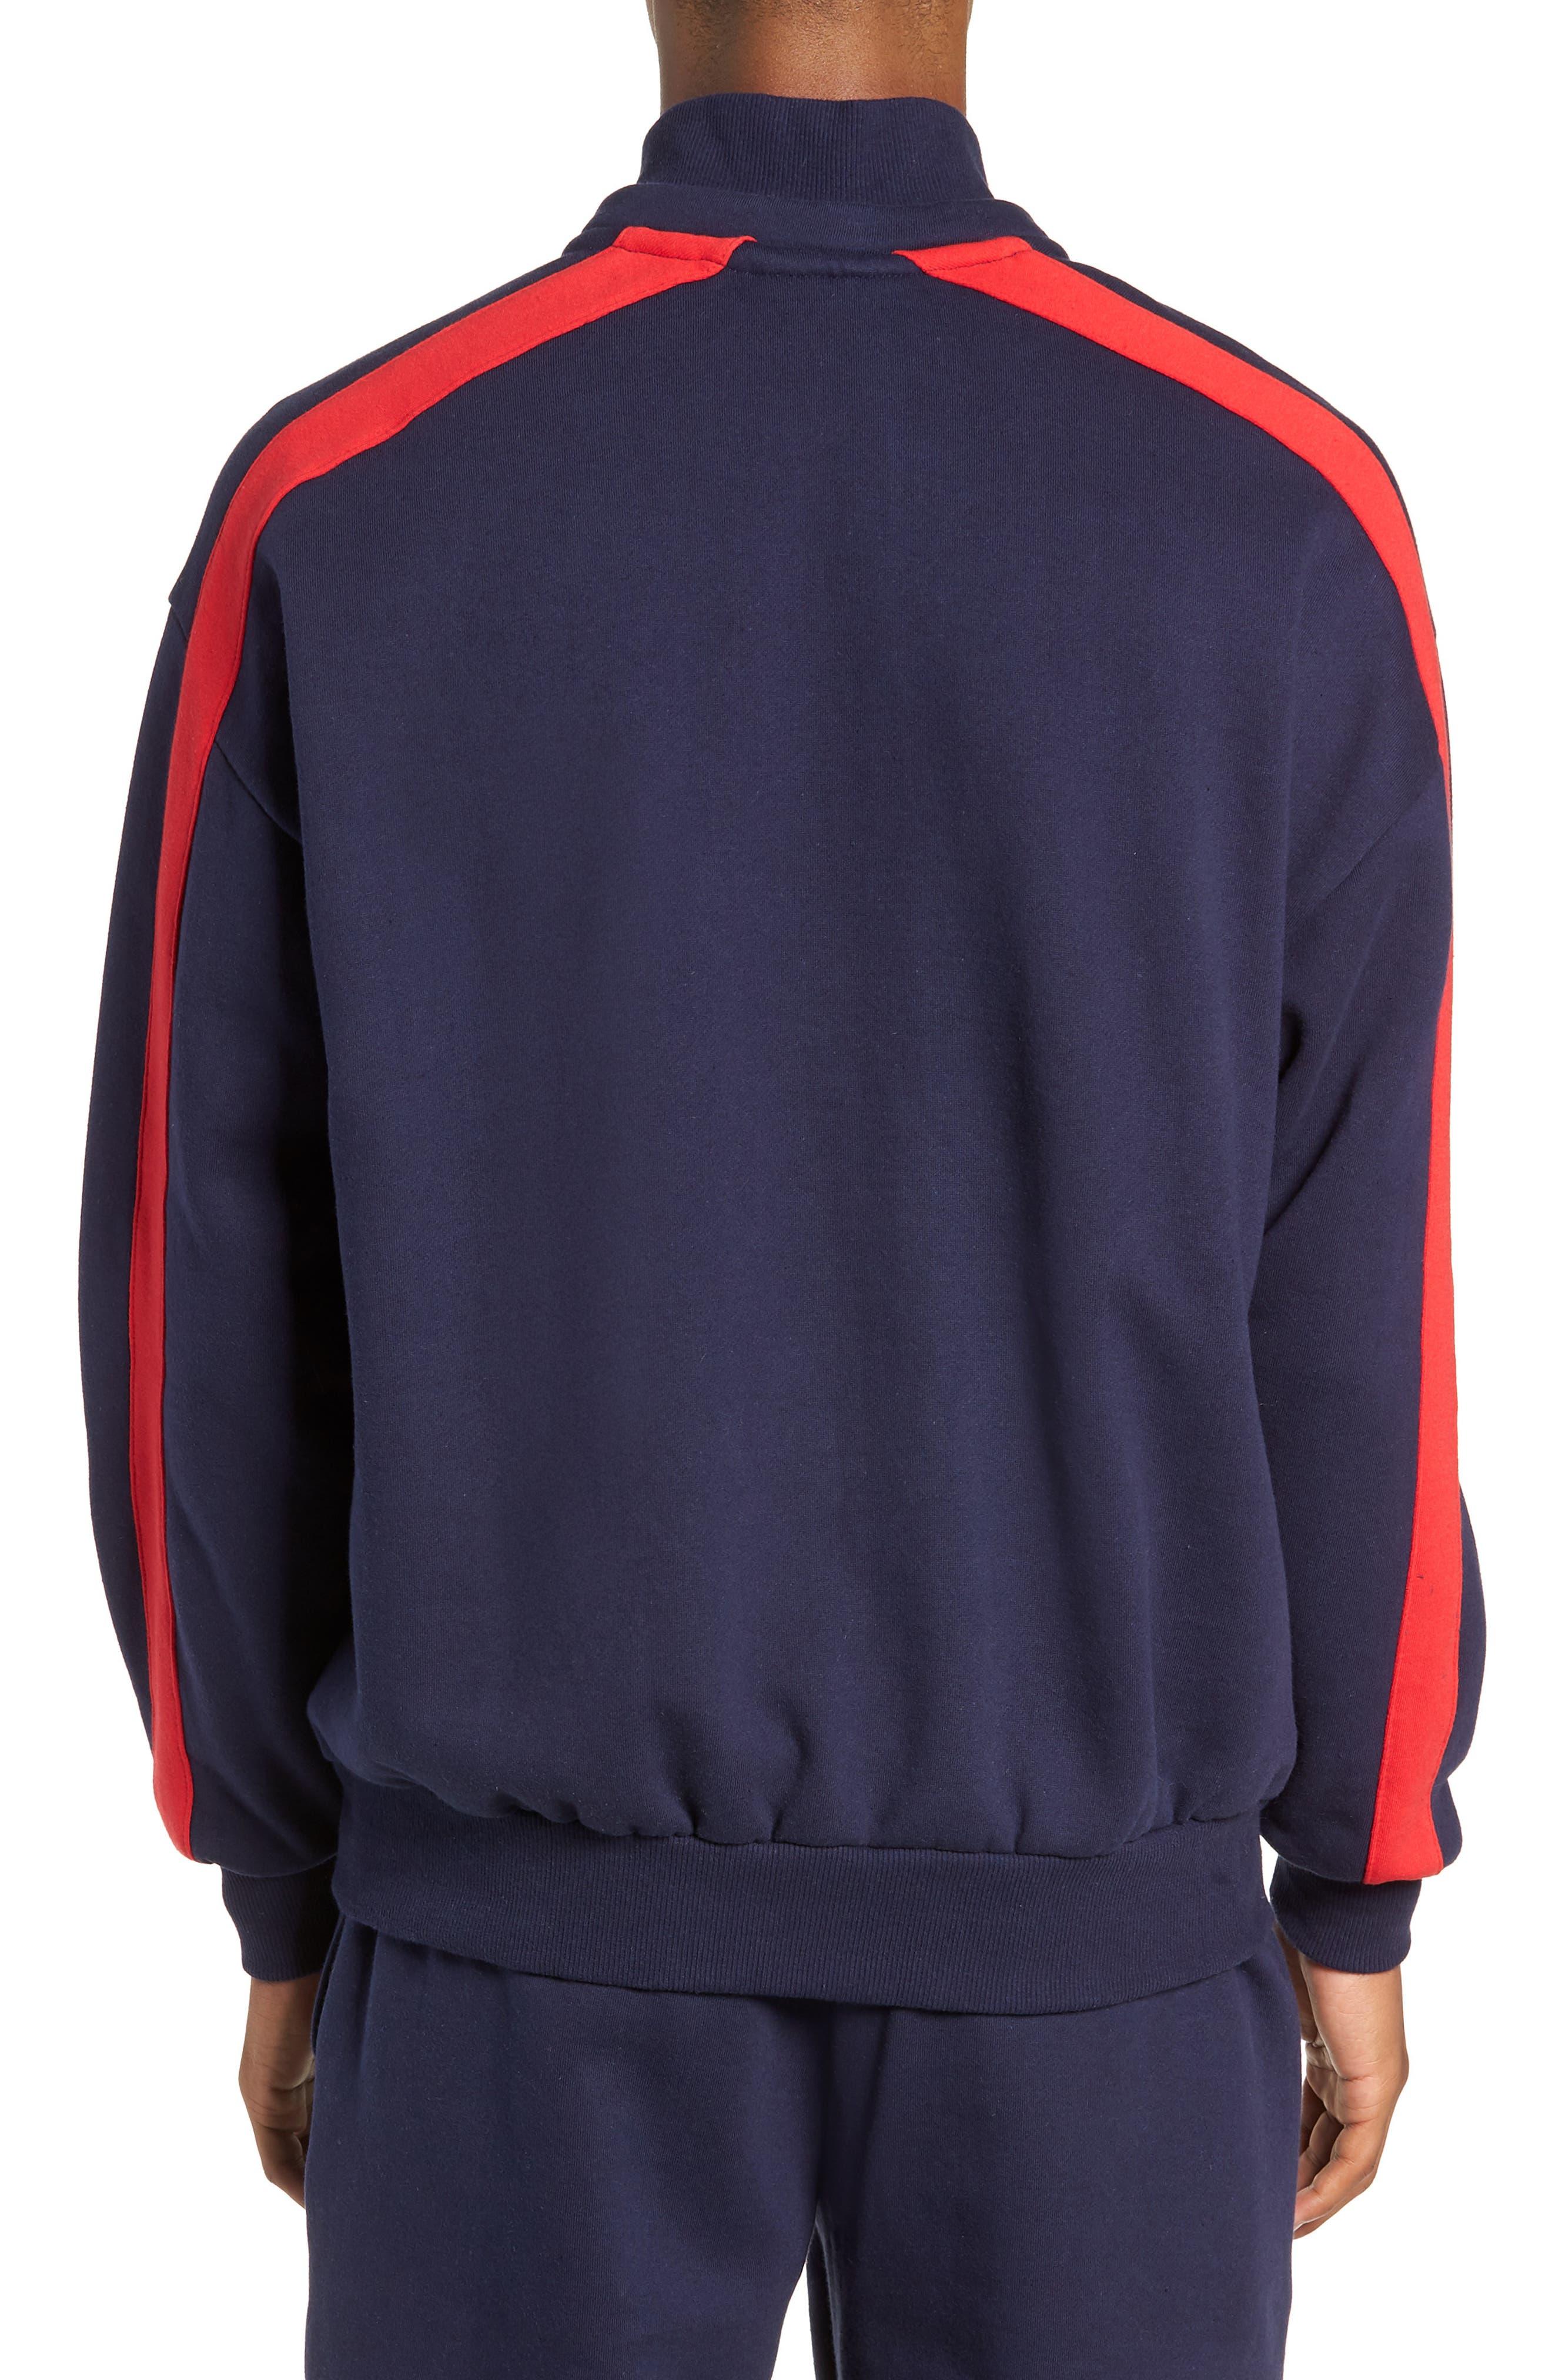 Quarter Zip Sweatshirt,                             Alternate thumbnail 2, color,                             PEACOAT/ WHITE/ CHINESE RED